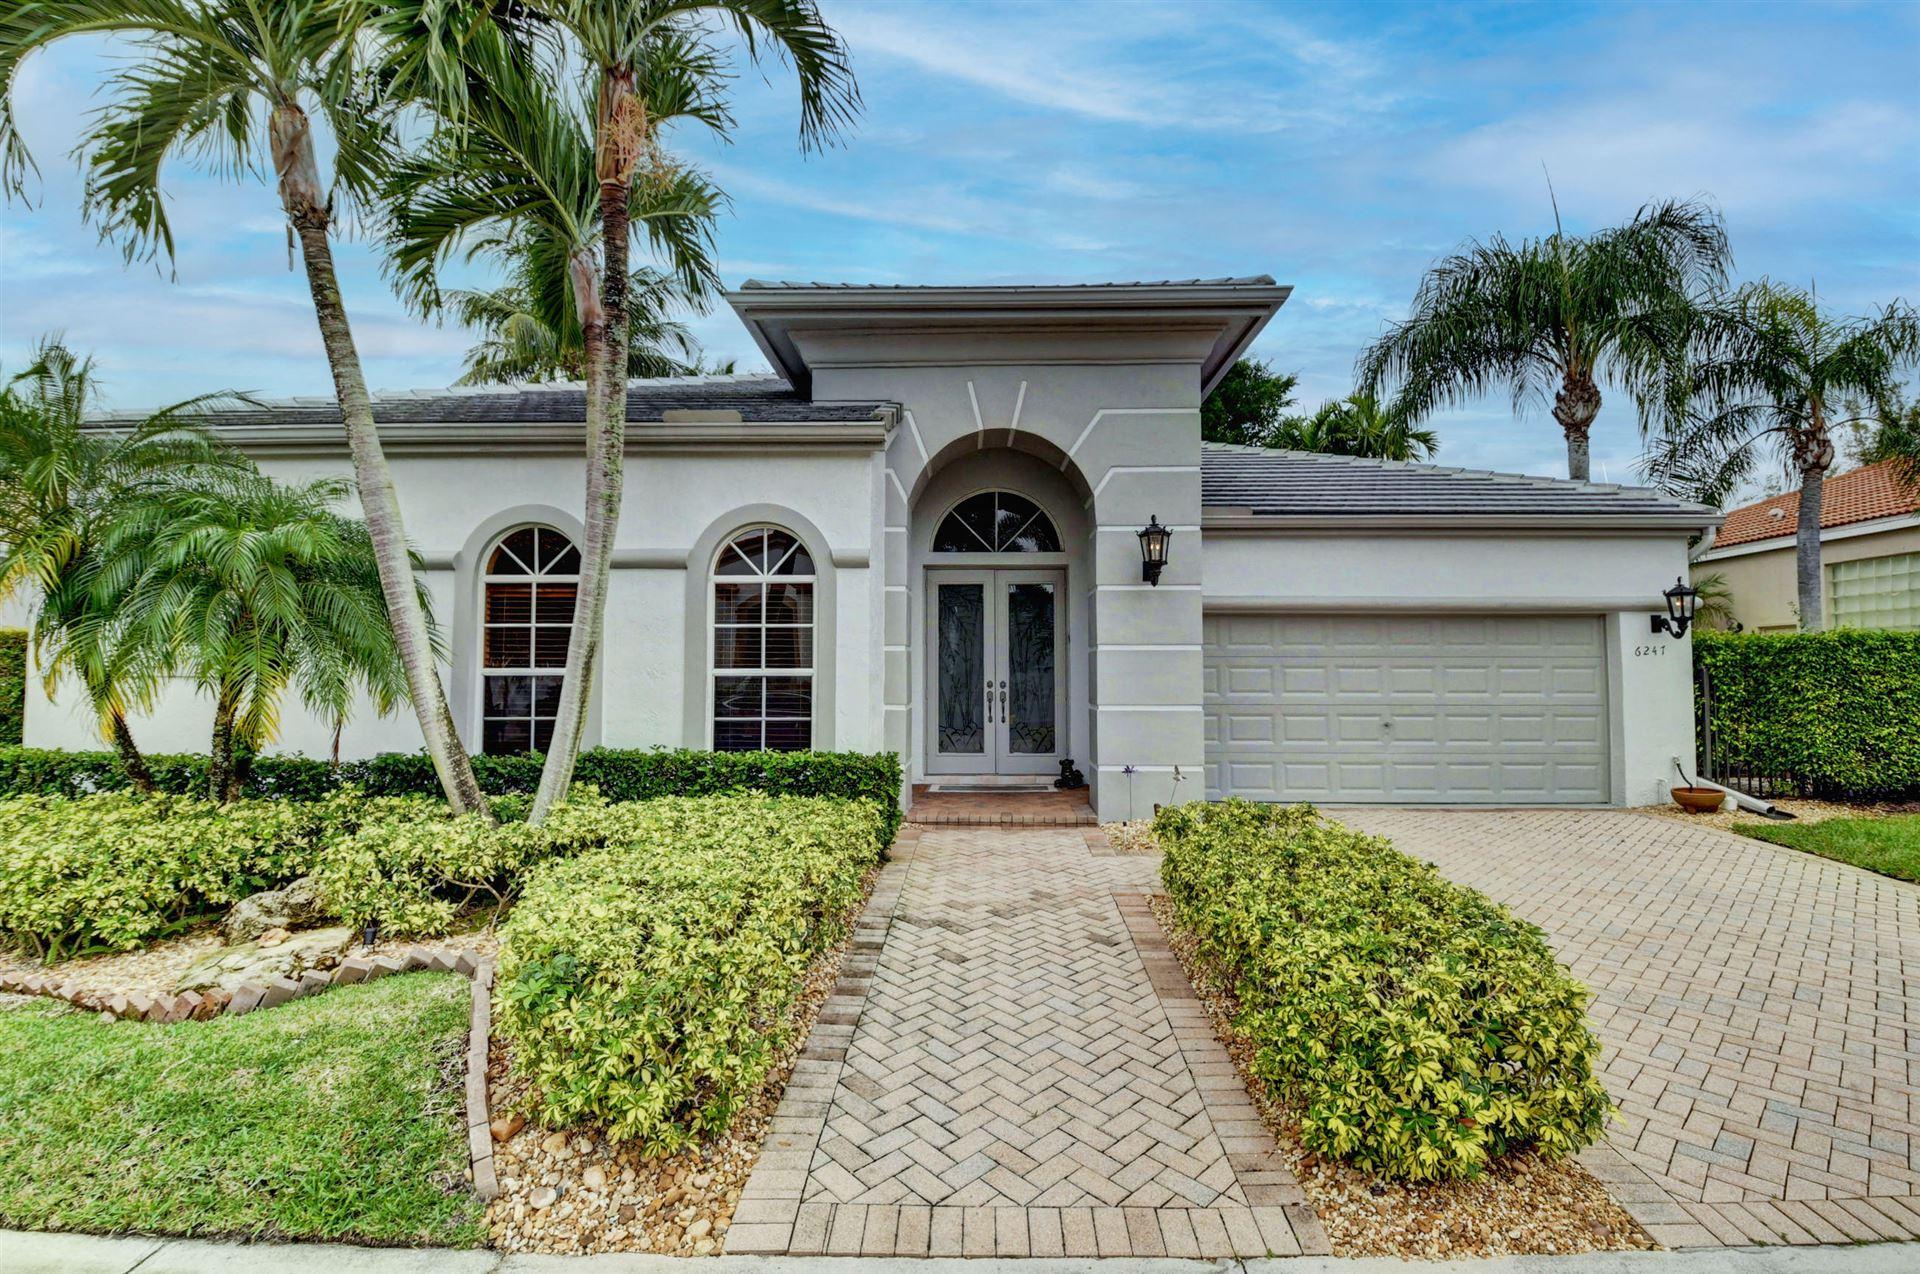 6247 NW 43rd Terrace, Boca Raton, FL 33496 - MLS#: RX-10663970